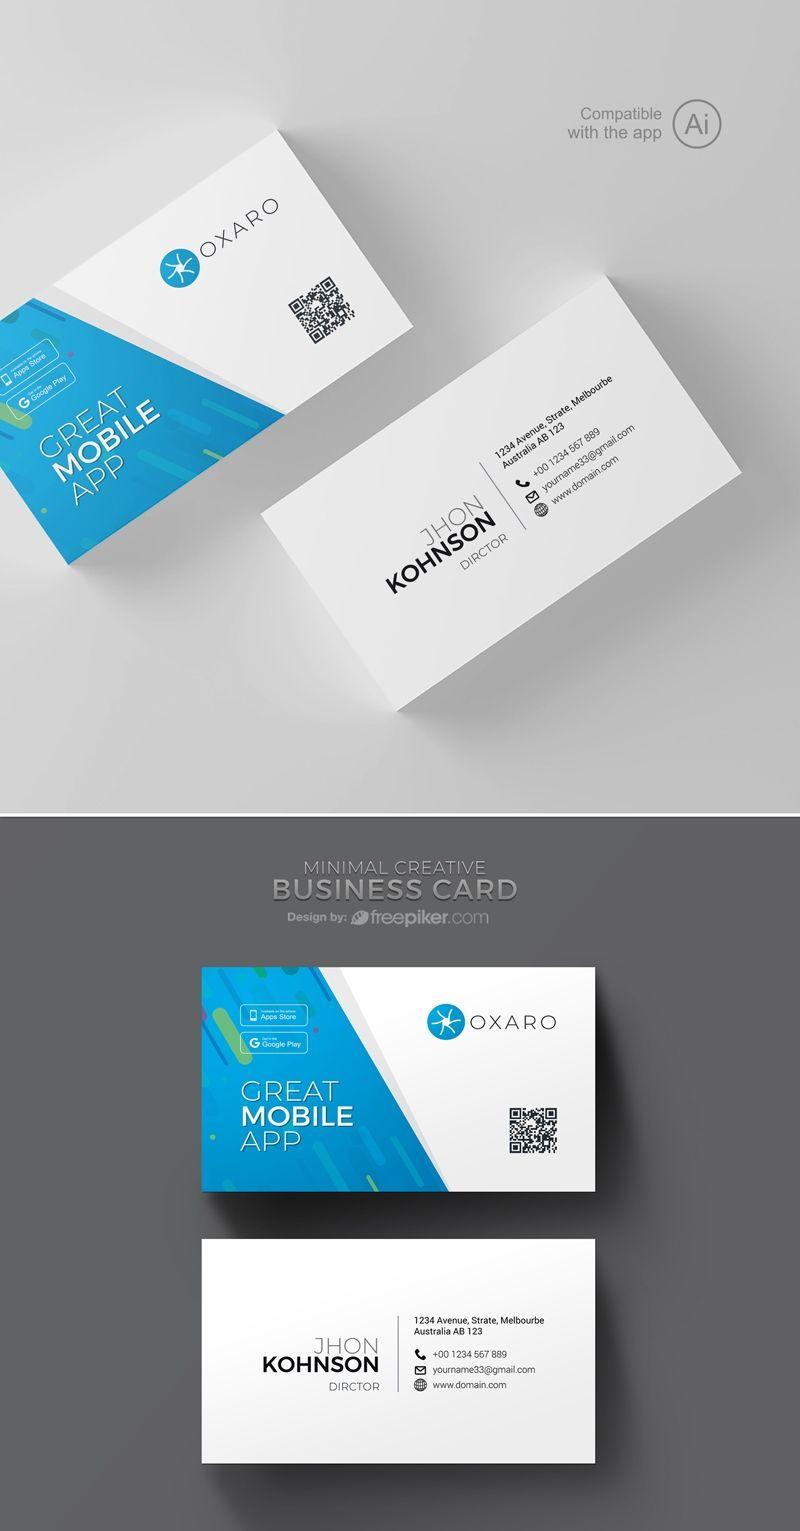 Freepiker Great Mobileapp Business Card Template Business Card Template Business Cards Creative Business Card Design Creative